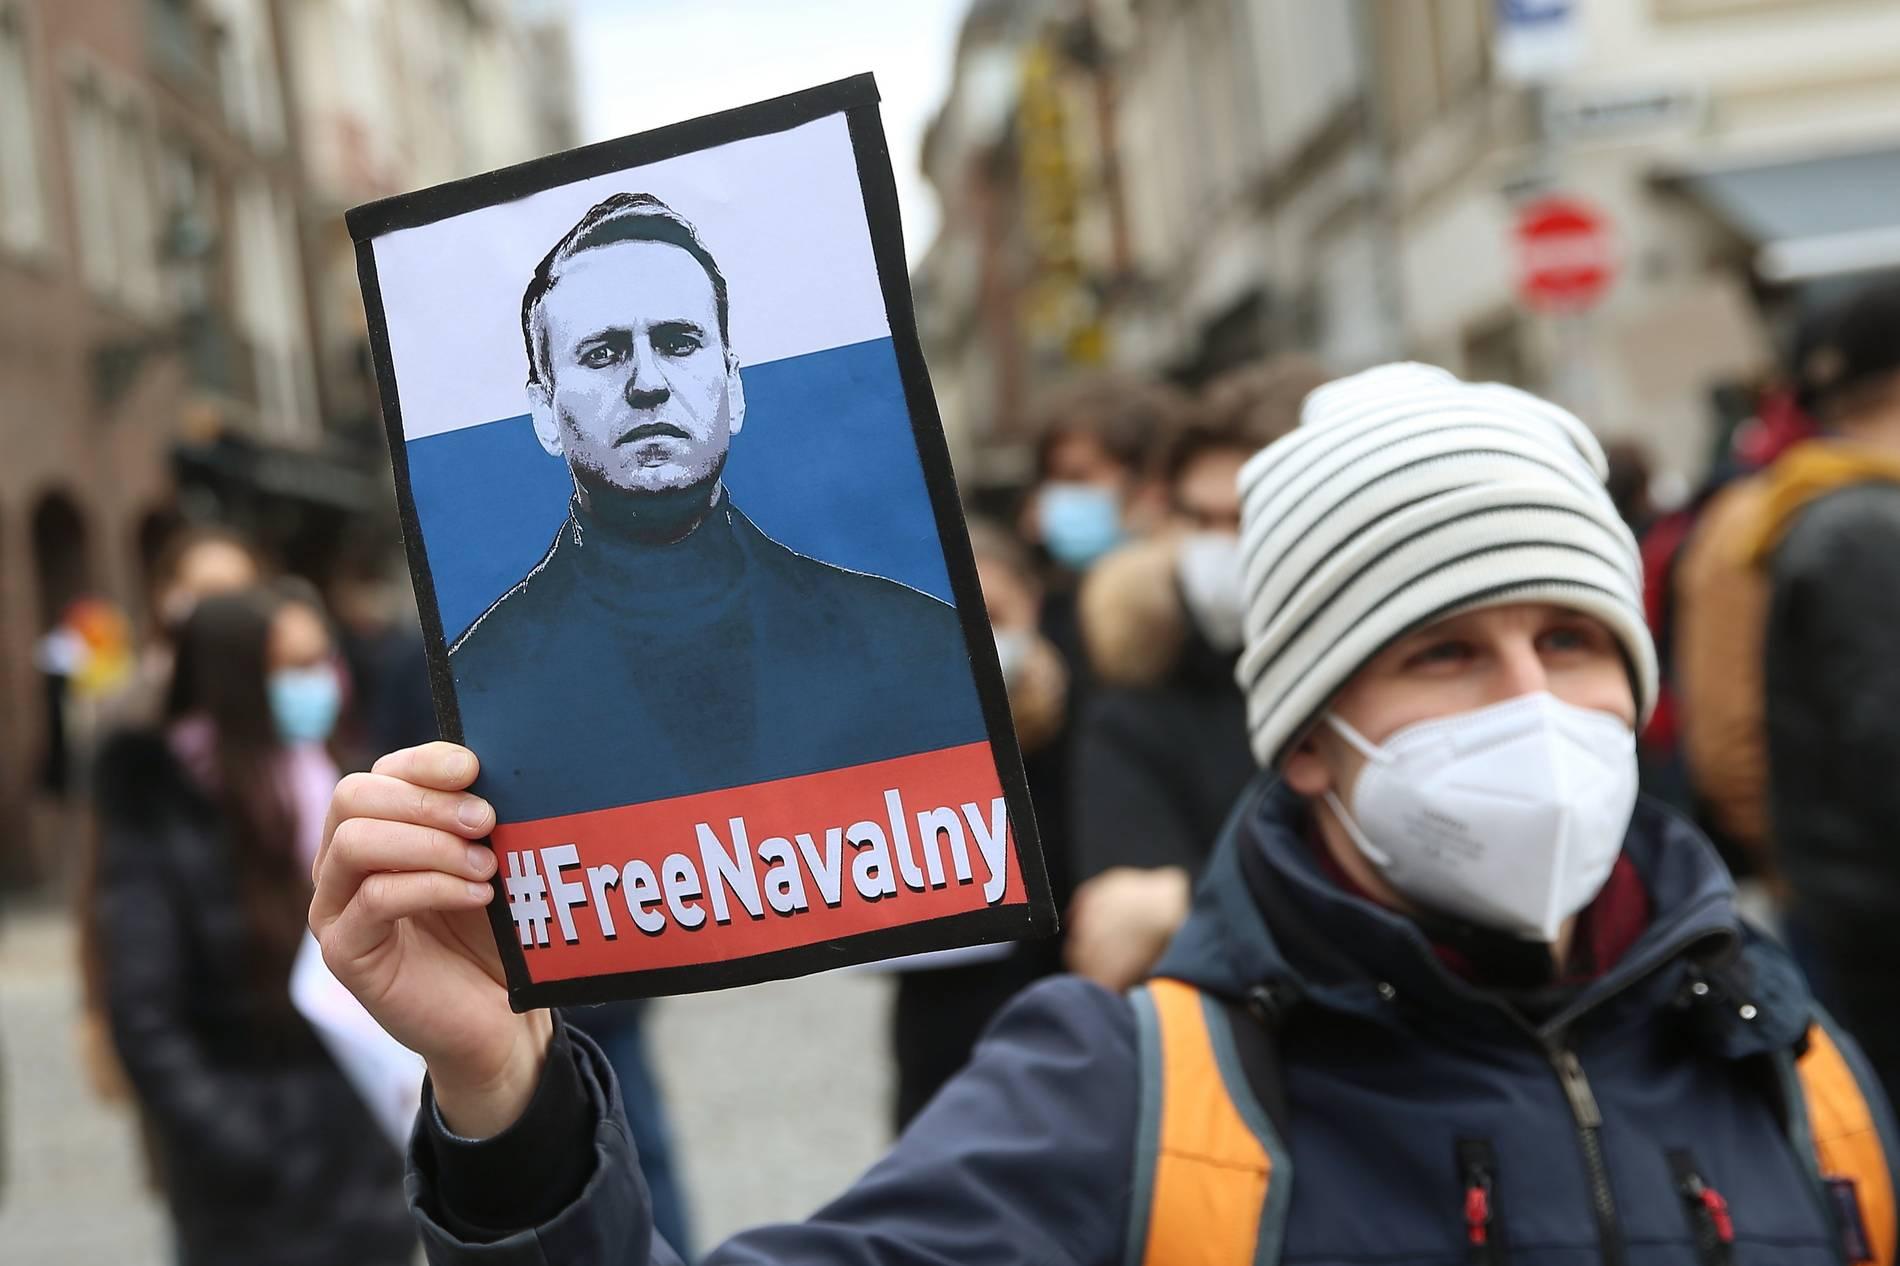 Die Nerven liegen blank - 3400 Festnahmen bei Nawalny-Protesten